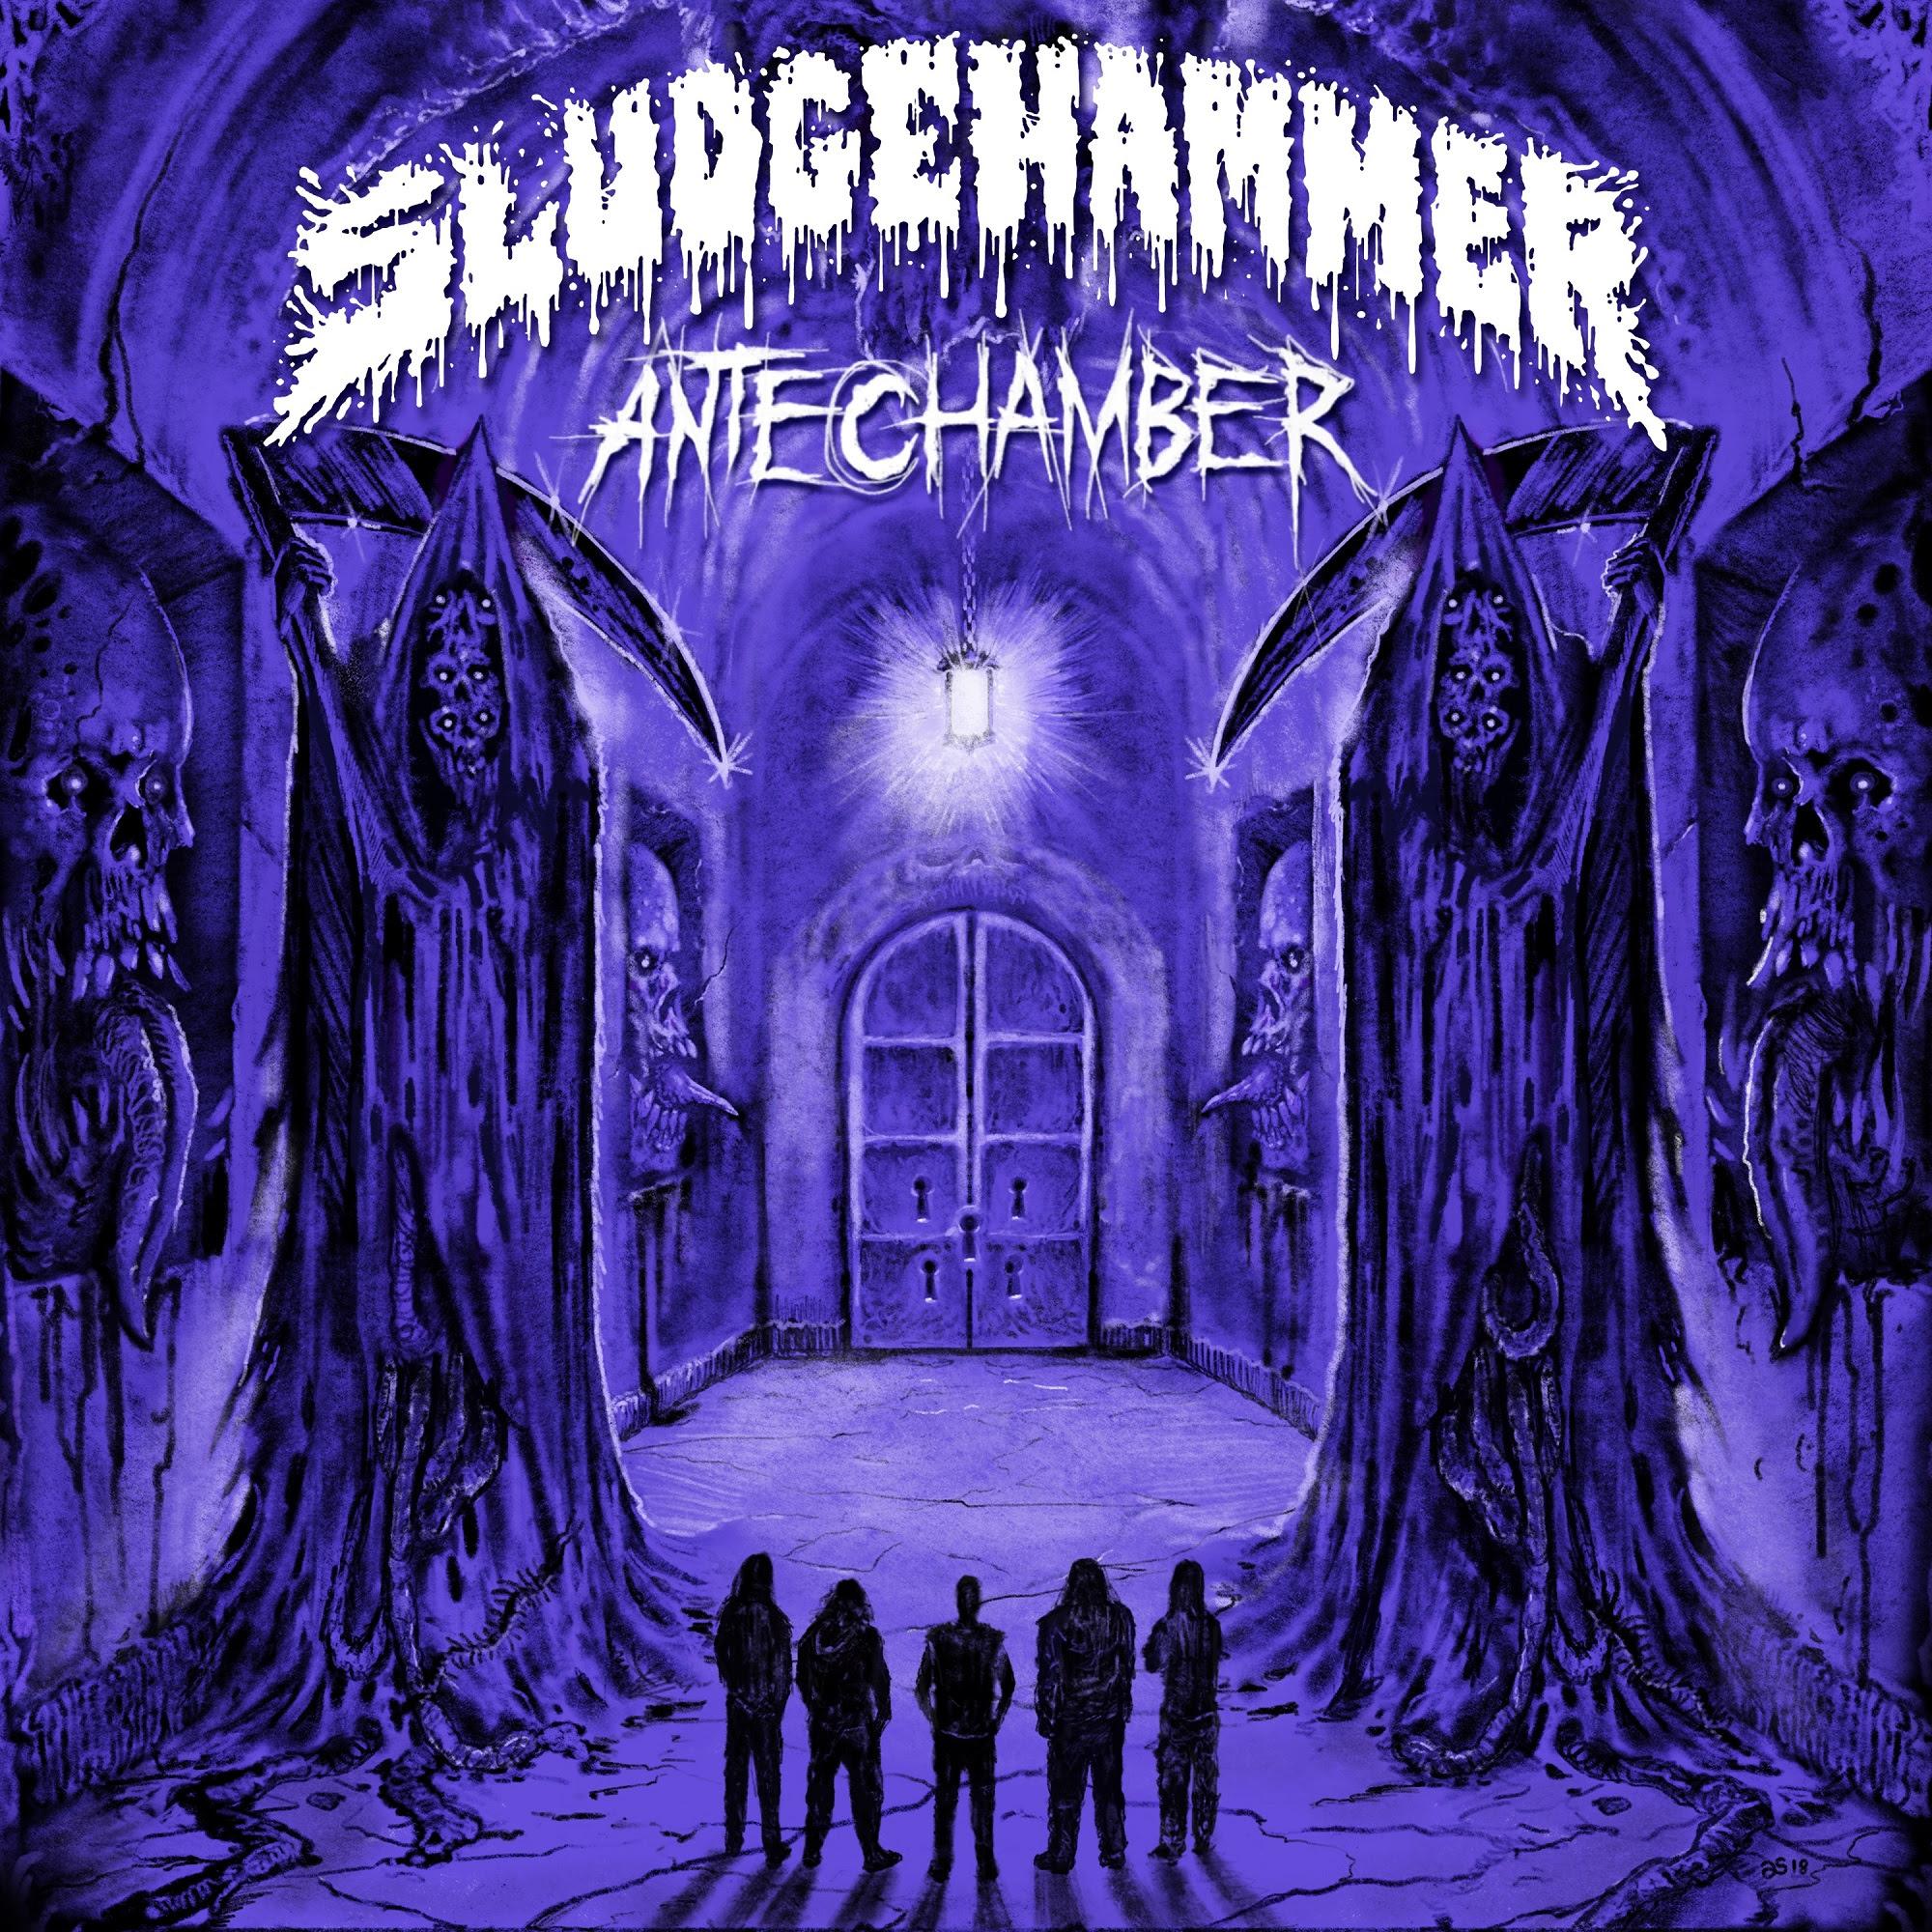 Track Listing:  1. No Control (5:08) 2. Broken Sea (5:09) 3. Climatic Death (5:02) 4. Forsaken Souls (4:41) 5. Balance Of Life (5:00) 6. The Long Road (5:02) 7. Eternal Darkness (4:10) 8. Supernova Silhouette (8:37) 9. Line 'Em Up (4:11) Album Length: 47:04   For More Info:   http://www.facebook.com/sludgehammermusic   https://www.instagram.com/sludgehammermusic   https://twitter.com/sludgehammermx